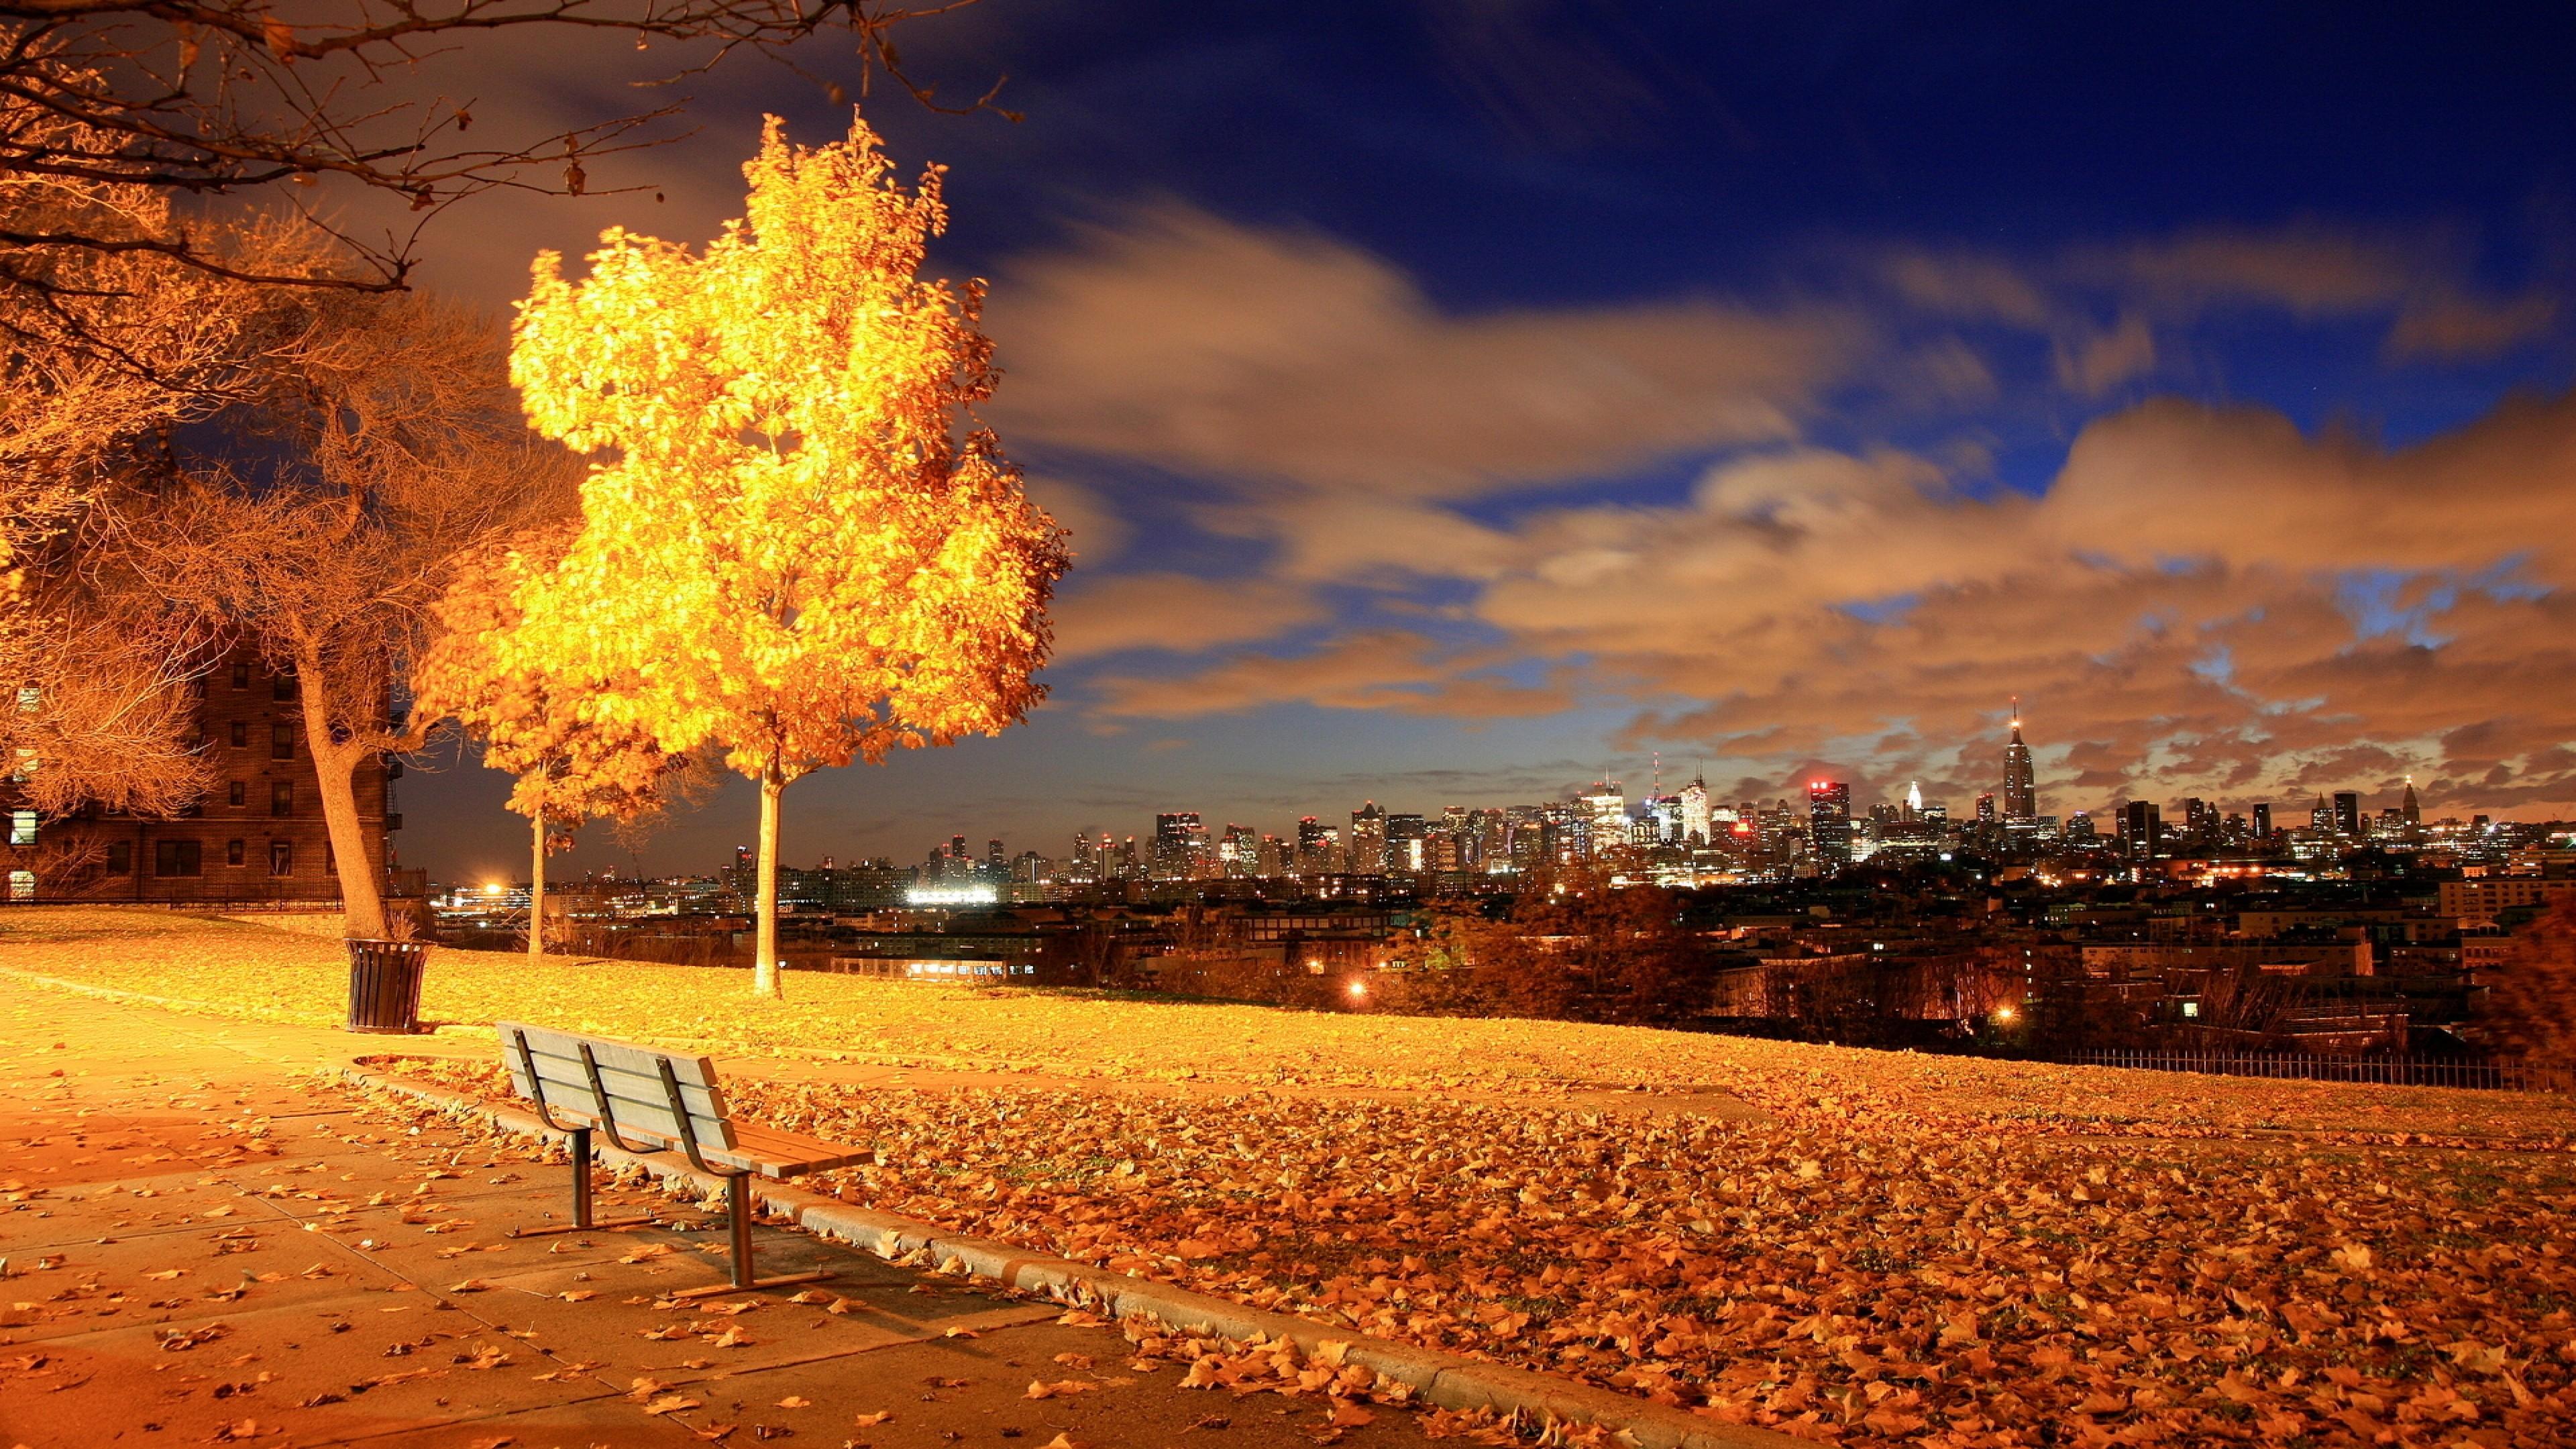 Fall Wallpapers HD 3840x2160